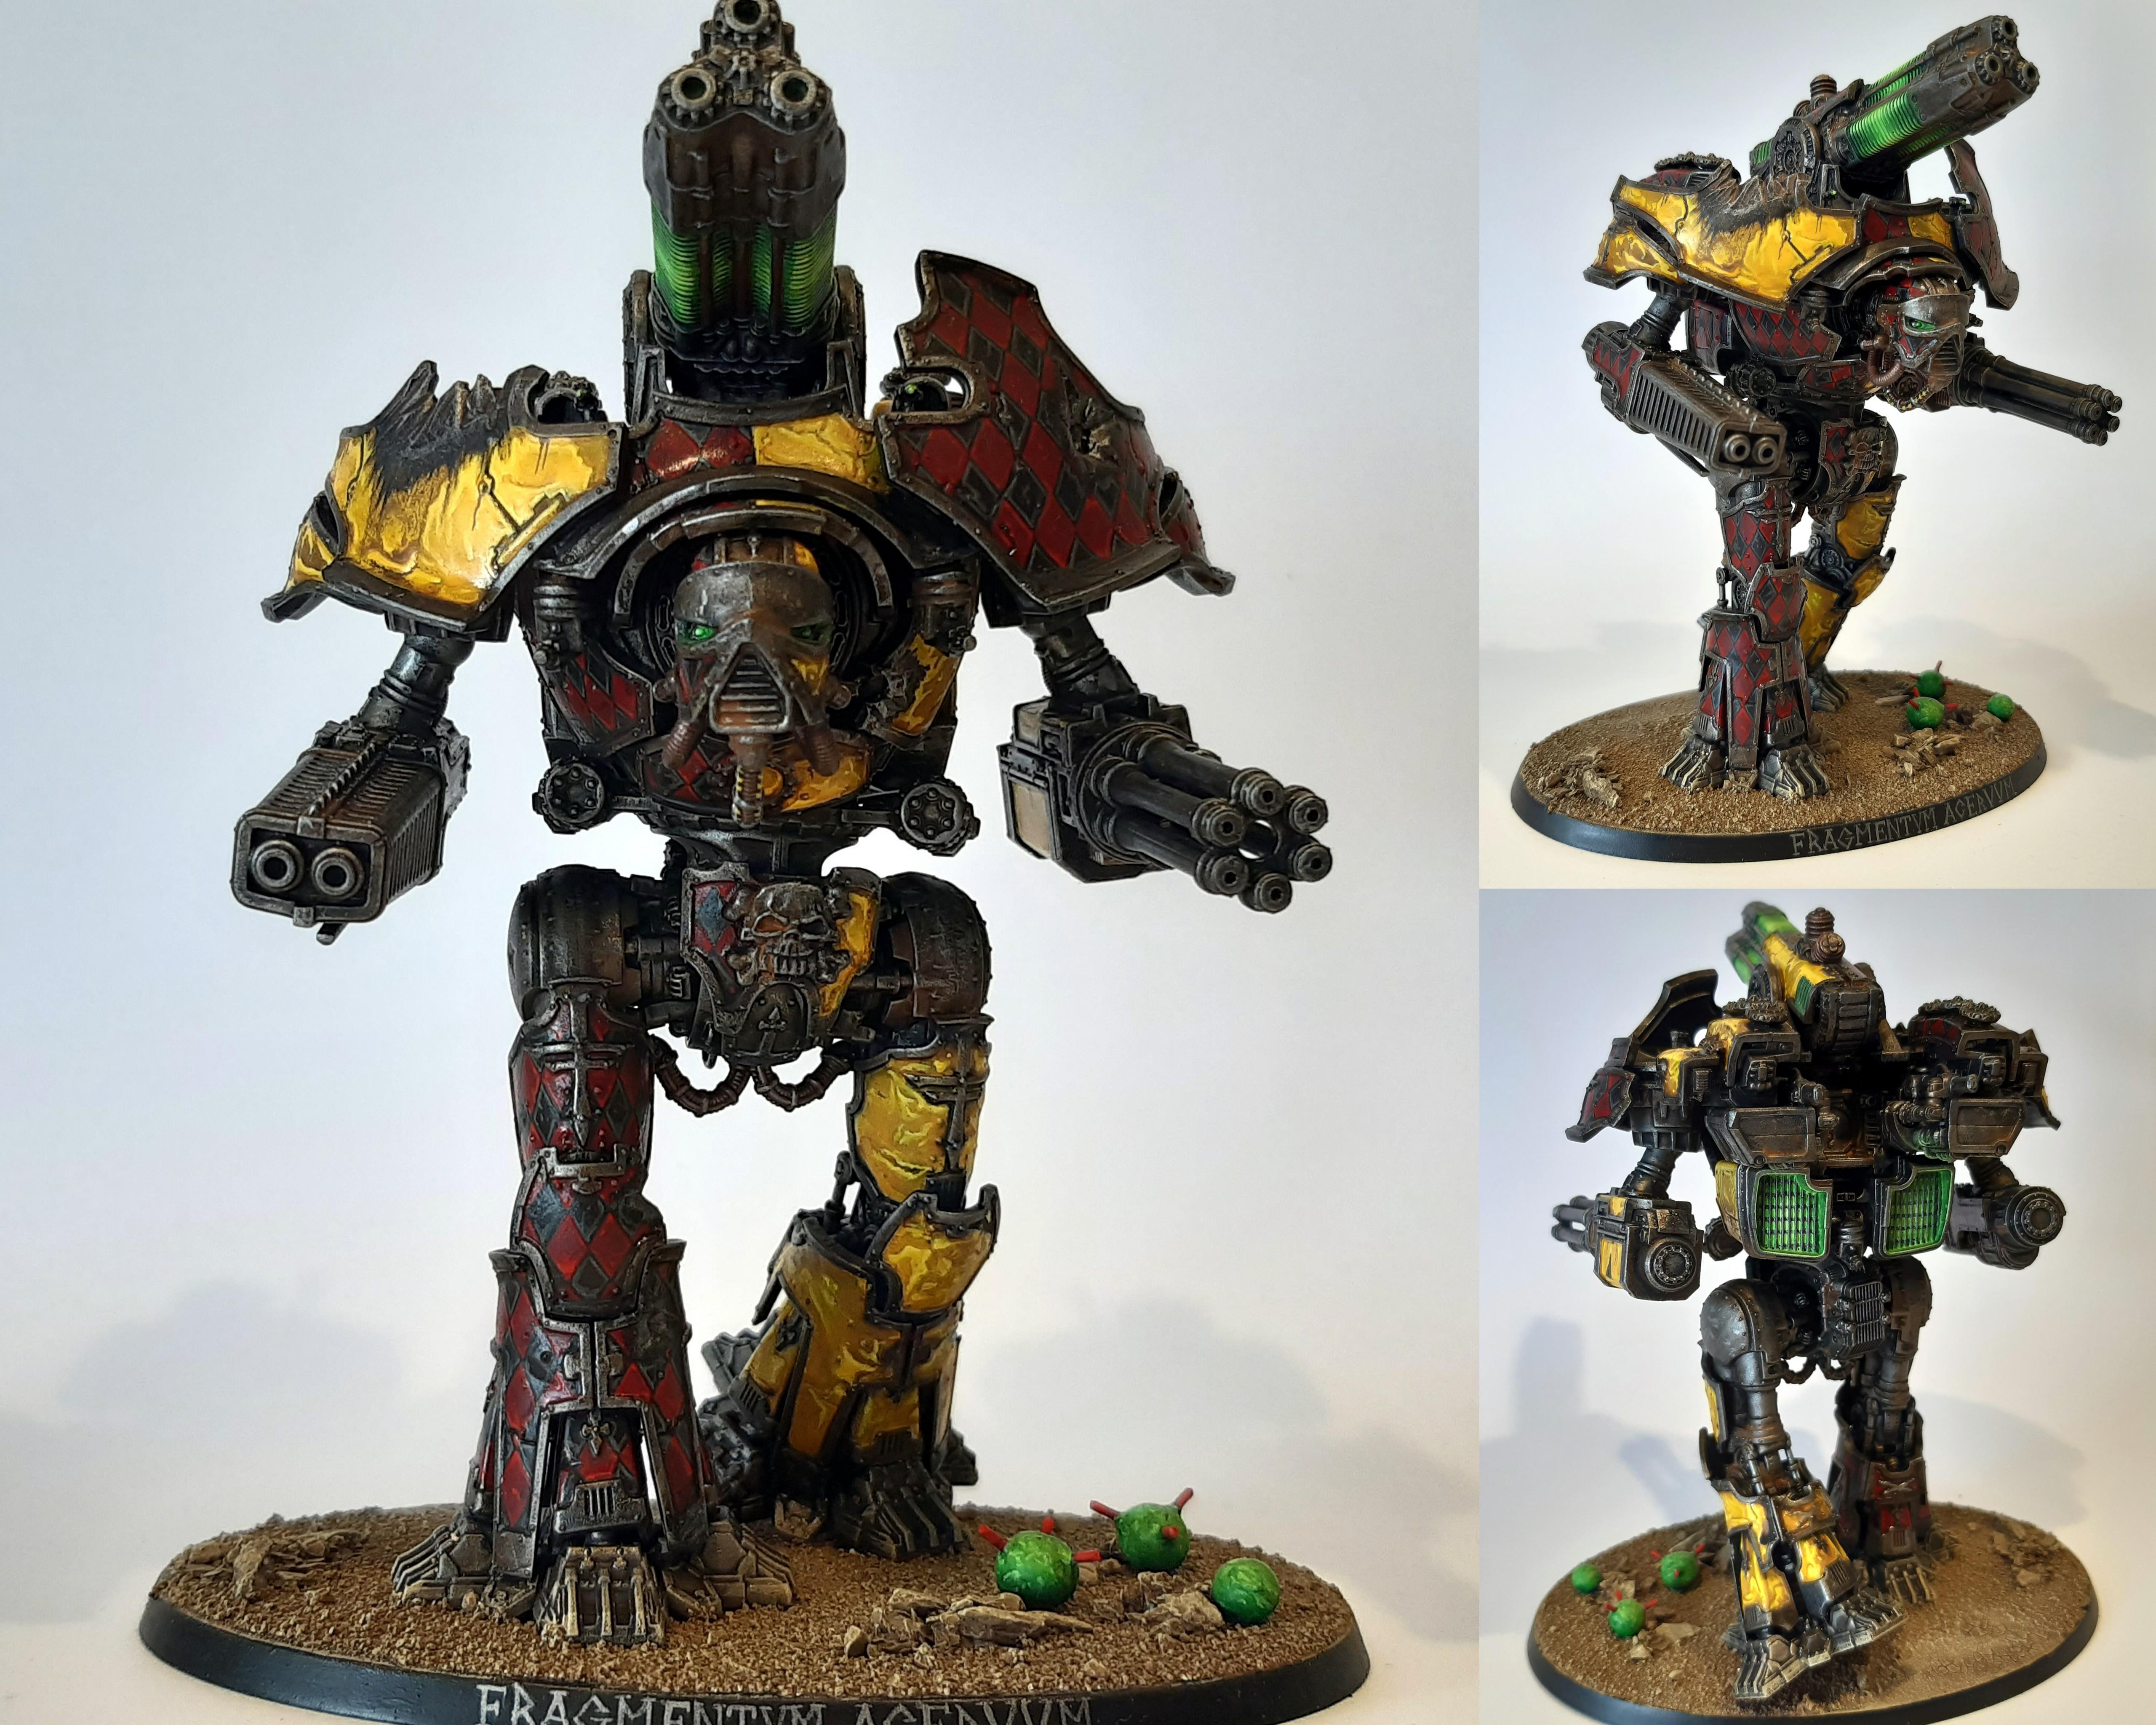 Adeptus Titanicus, Nemesis, Titan, Warbringer, Warhammer 40,000